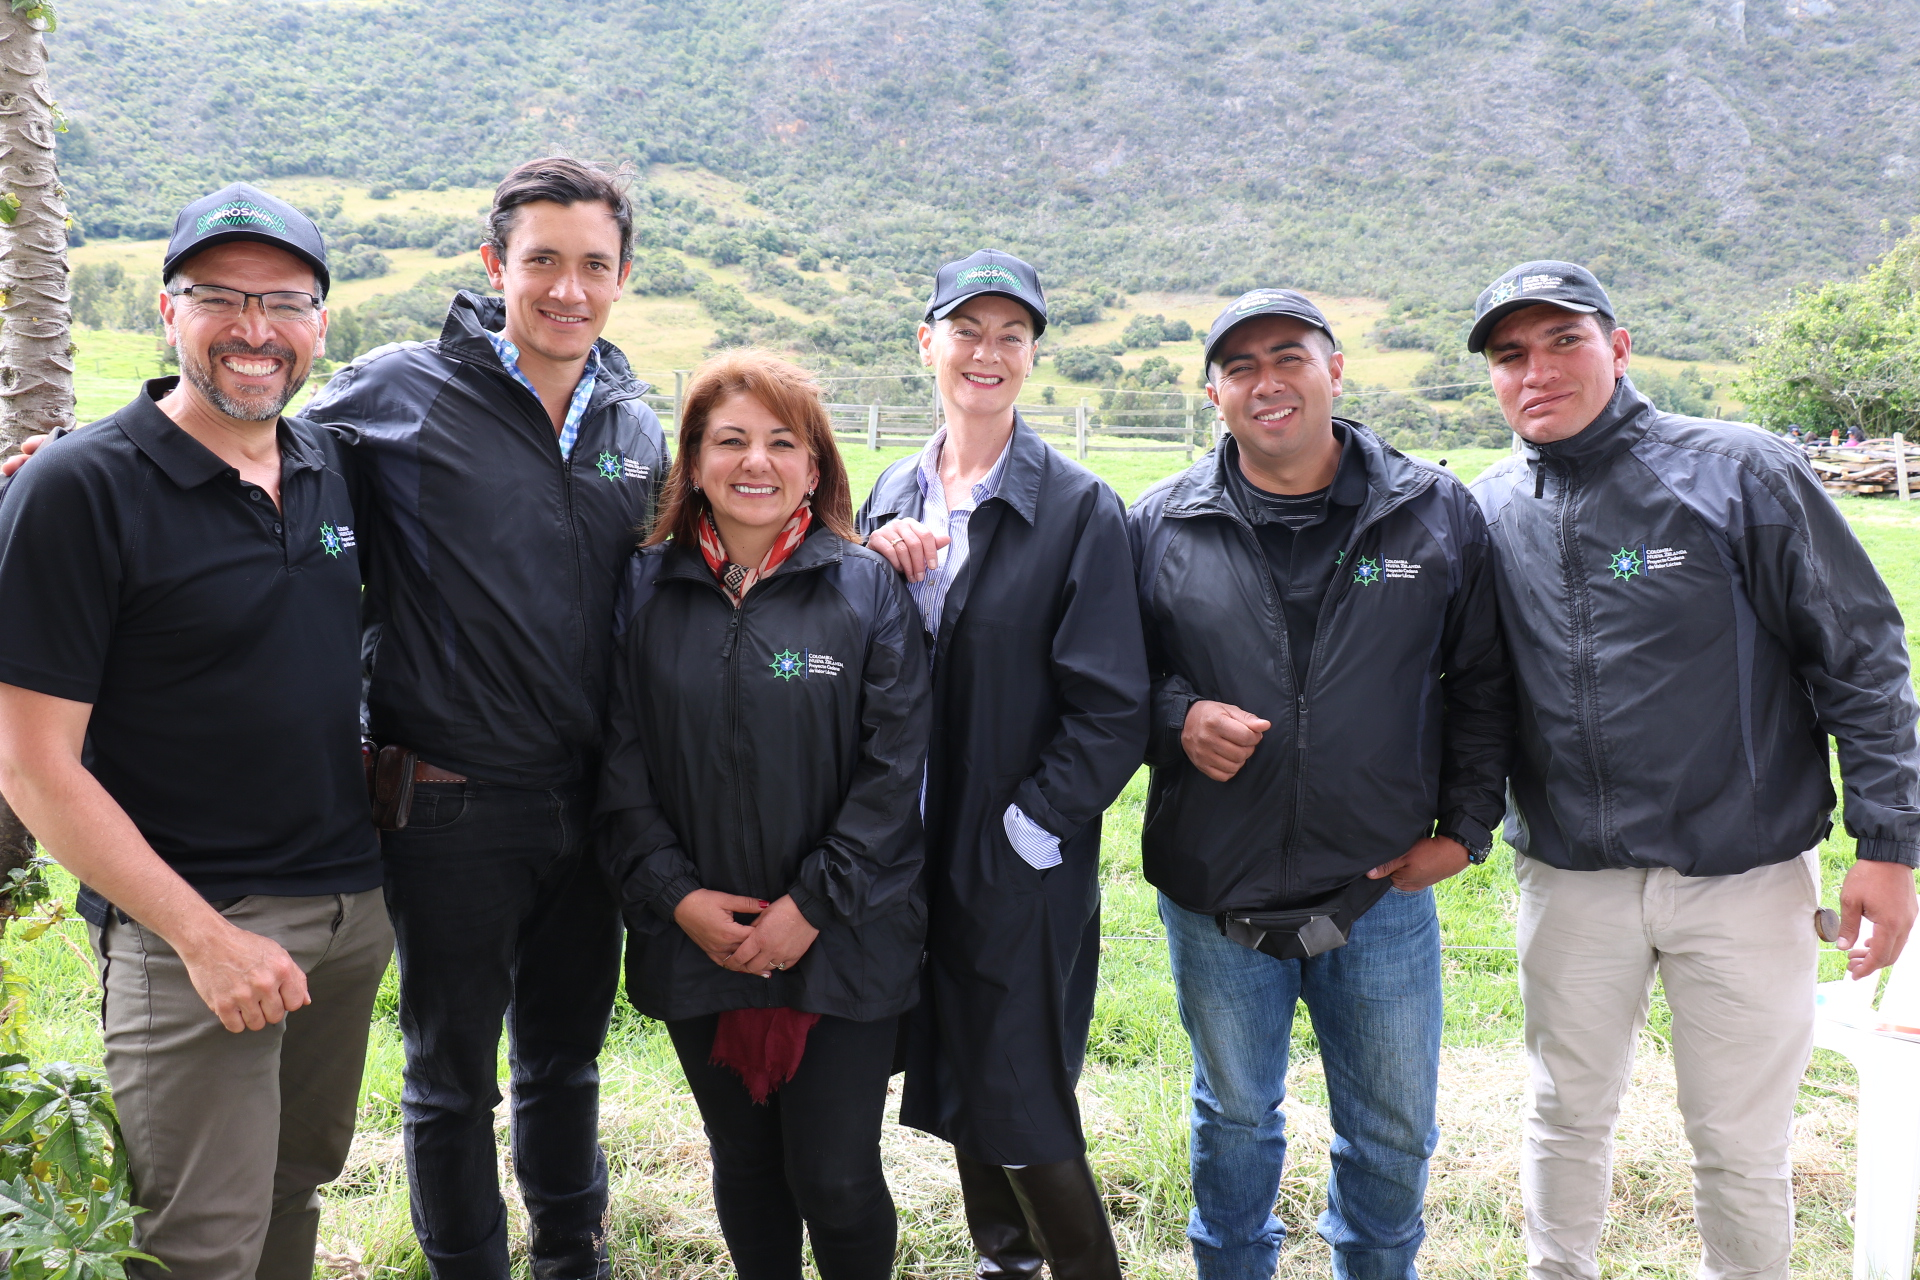 Our team in Colombia: Juan, Carlos, Giovanna, NZ Ambassador Lucy Duncan, Jesus, Camilo